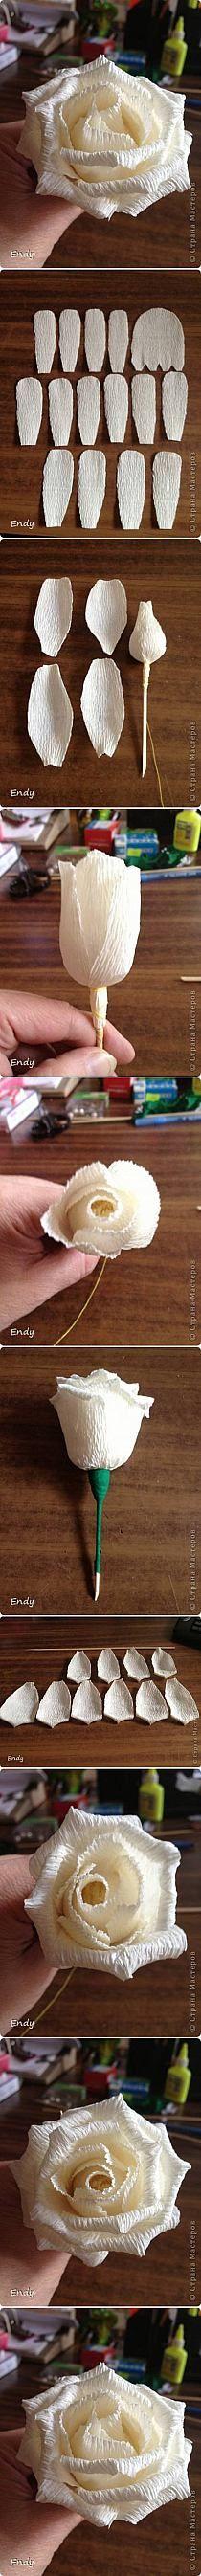 DIY Easy Corrugated Paper Rose DIY Easy Corrugated Paper Rose by diyforever Faux Flowers, Diy Flowers, Fabric Flowers, Flower Diy, White Flowers, Tissue Paper Flowers, Paper Roses, Diy Paper, Paper Crafts